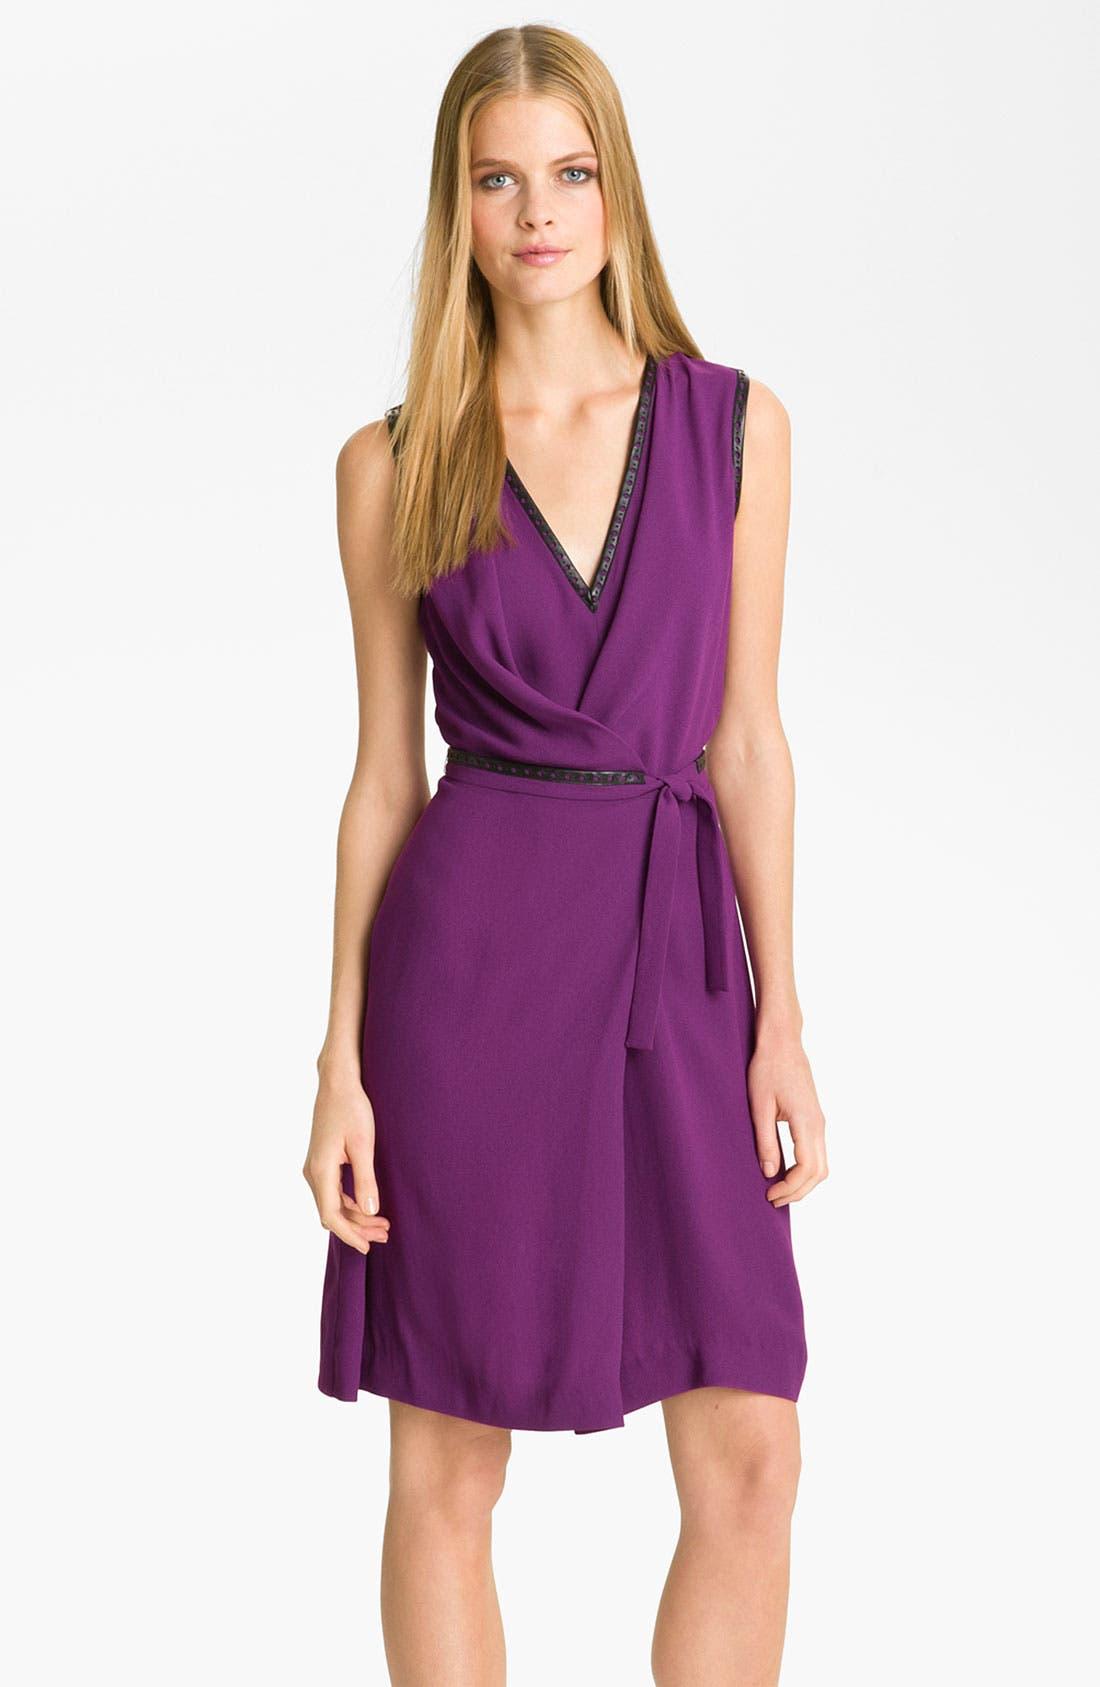 Alternate Image 1 Selected - Rachel Roy Crepe Faux Wrap Dress (Online Exclusive)